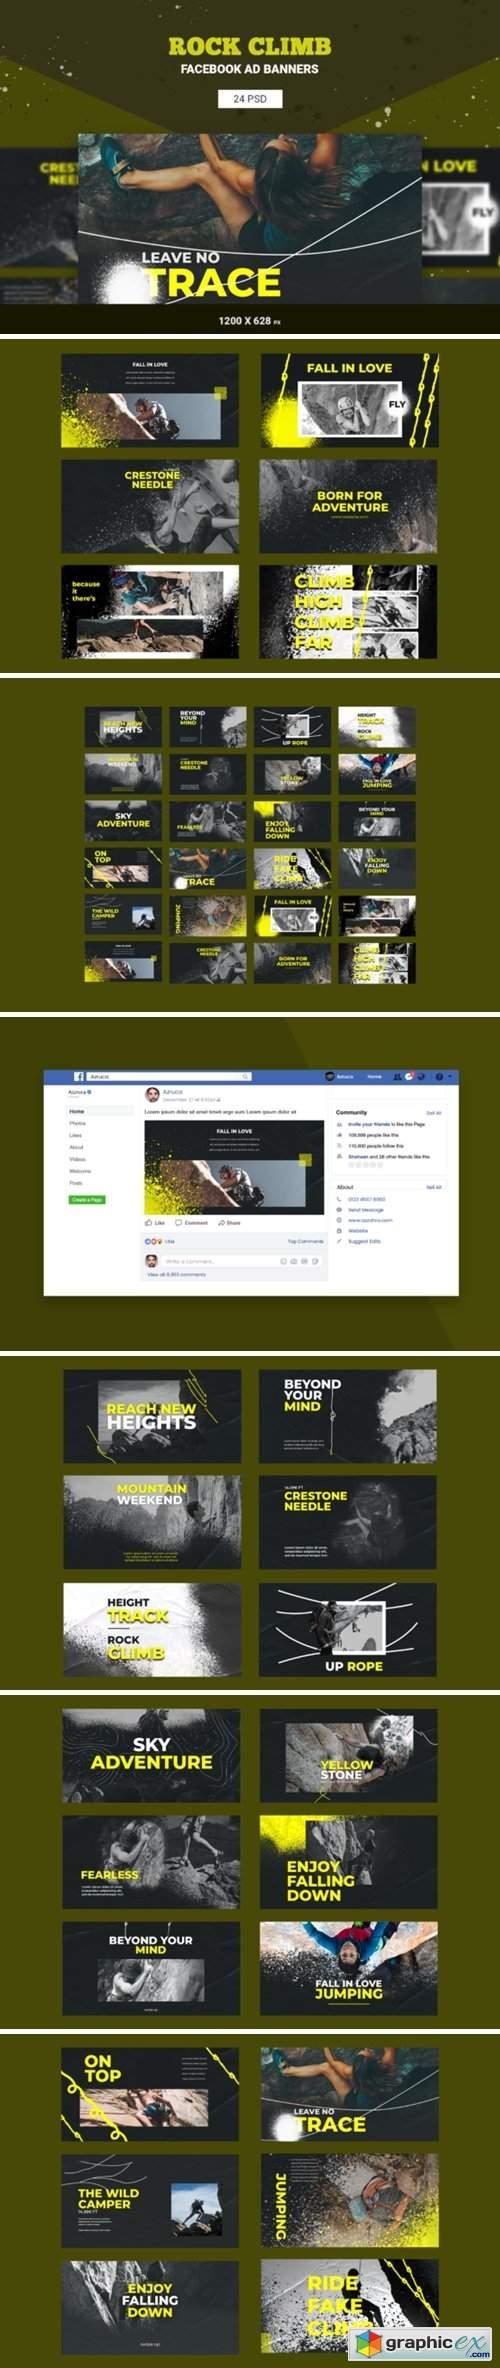 Rock Climb Facebook Ad Banners